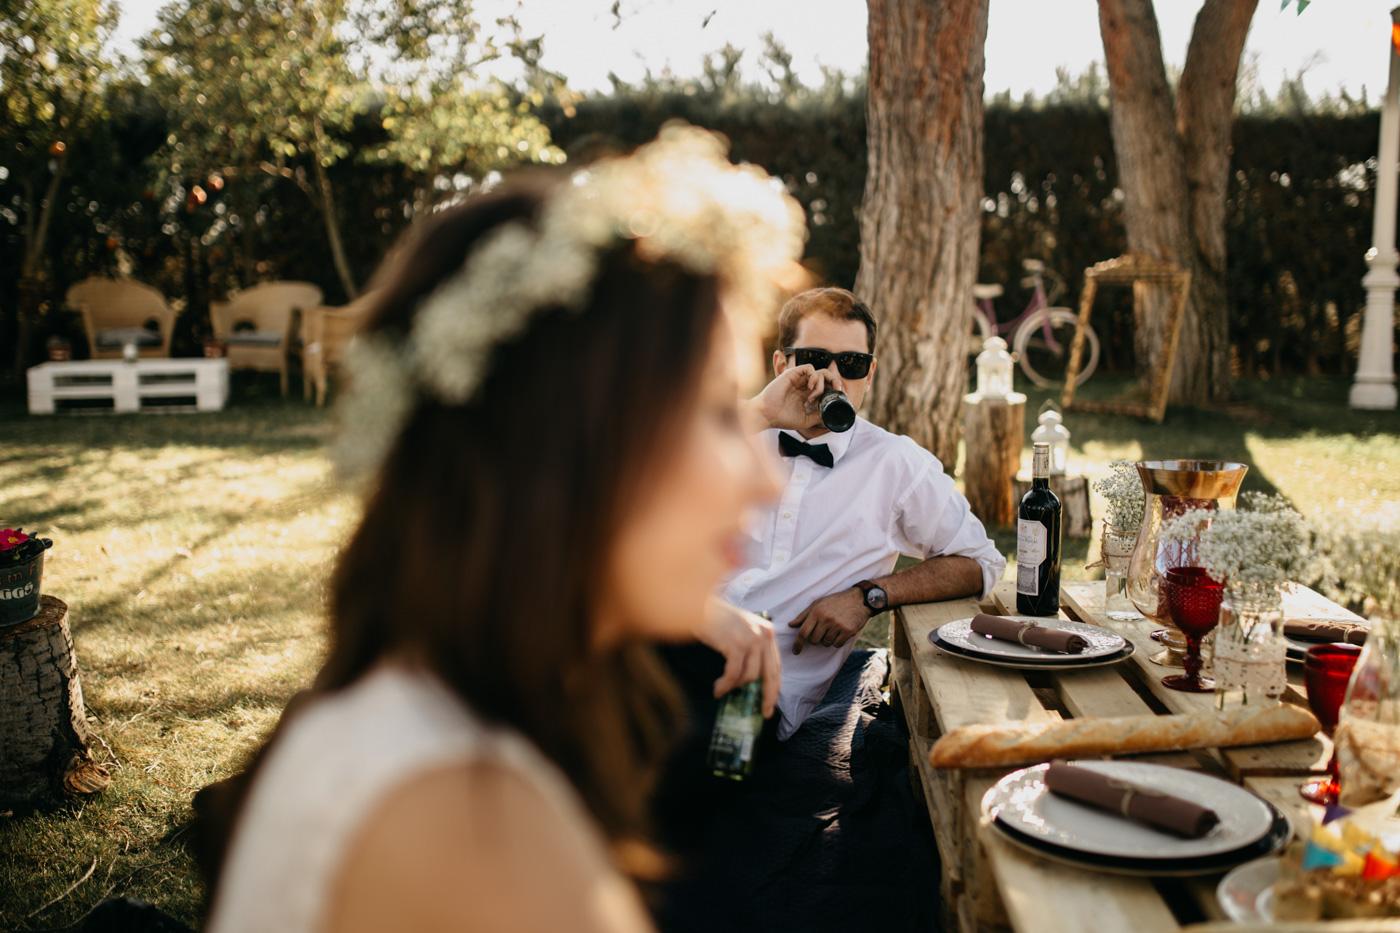 Velvet-Hush-fotografos-boda-al-aire-libre-madrid-064